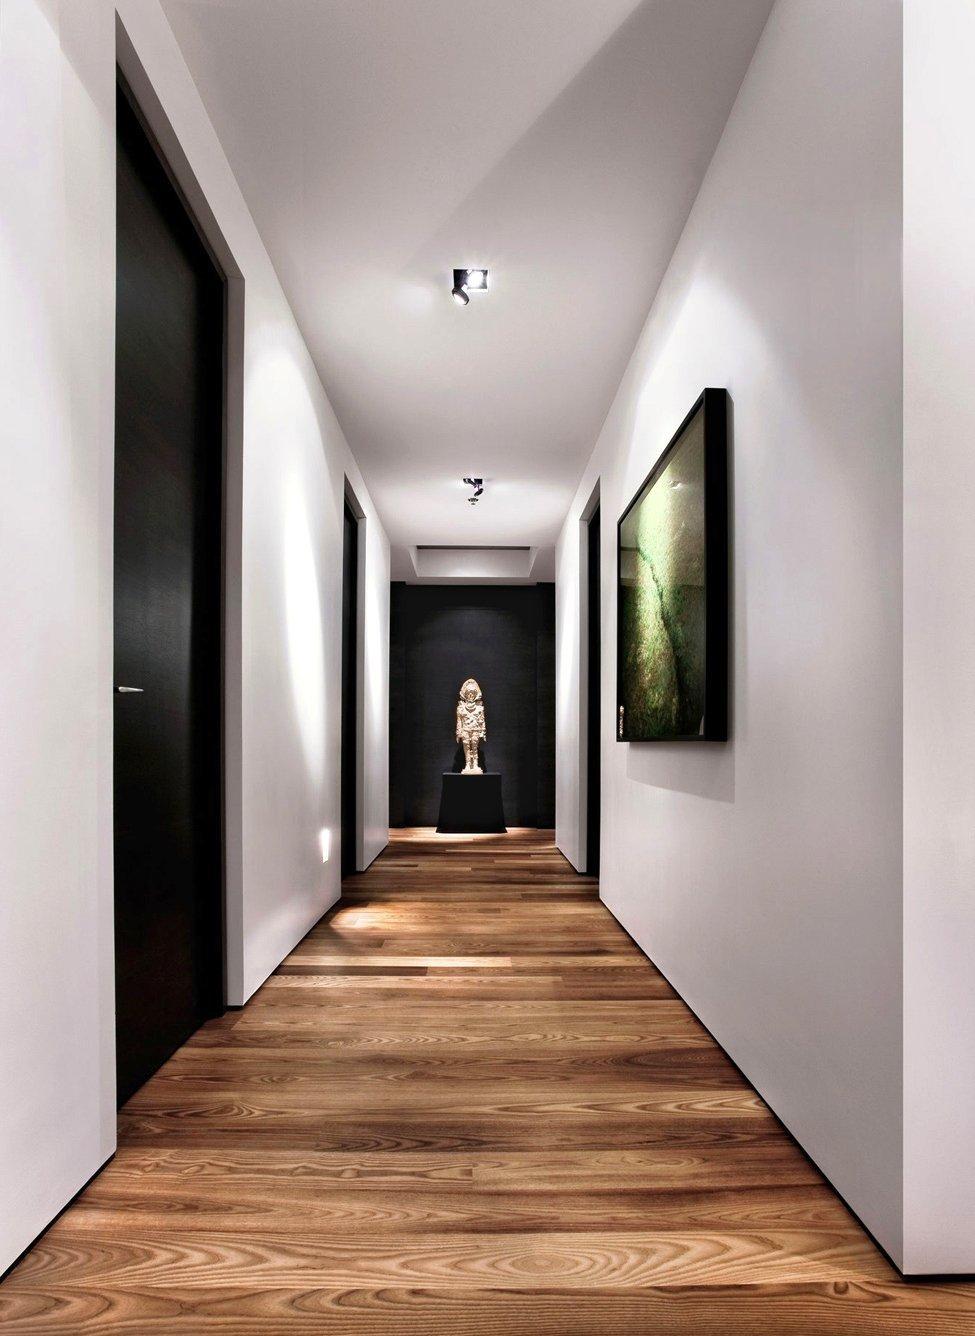 Ламинат под дерево в коридоре